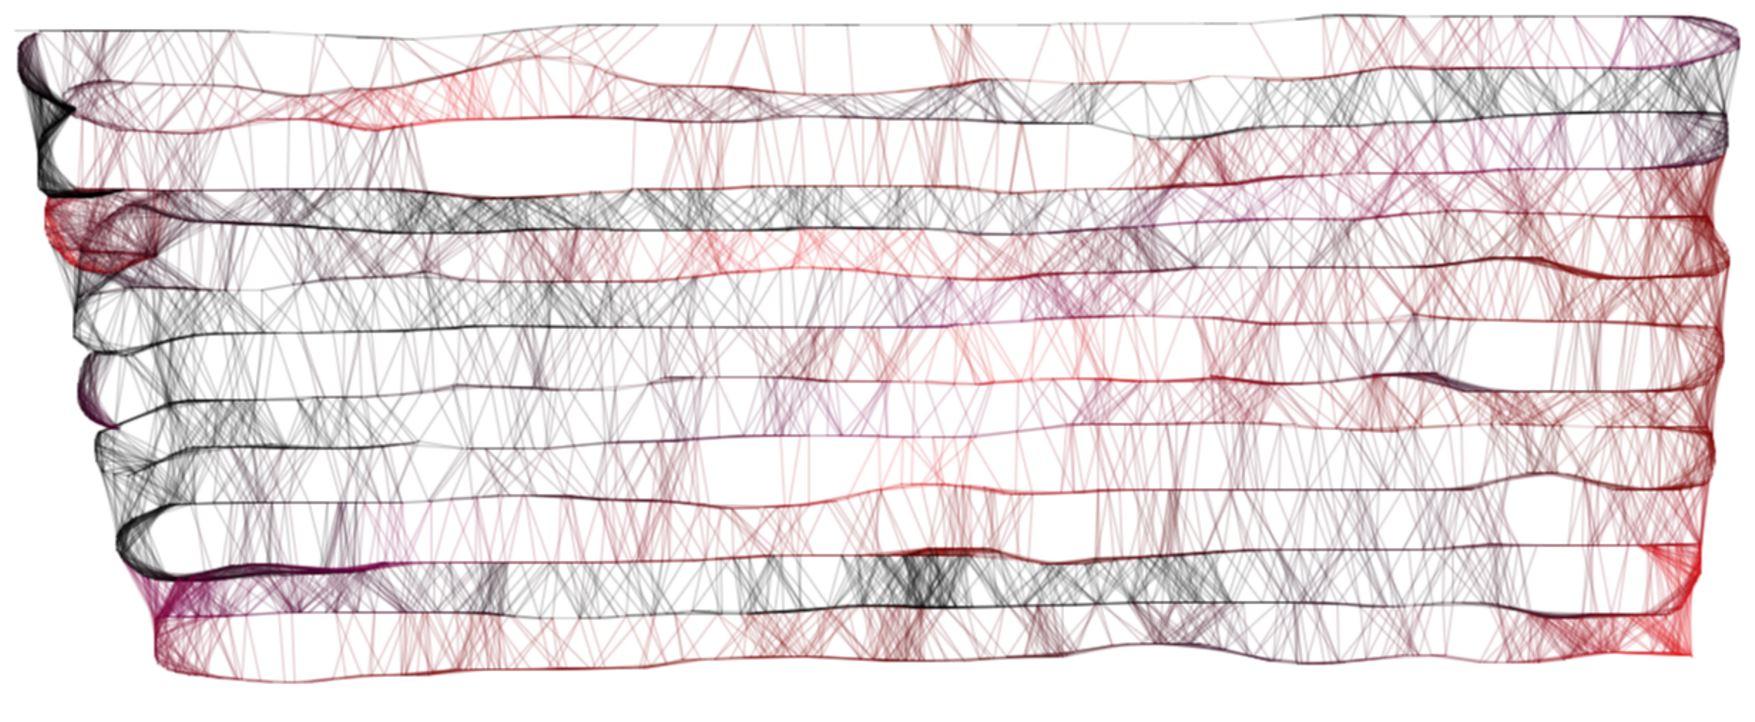 string theory basket case.JPG